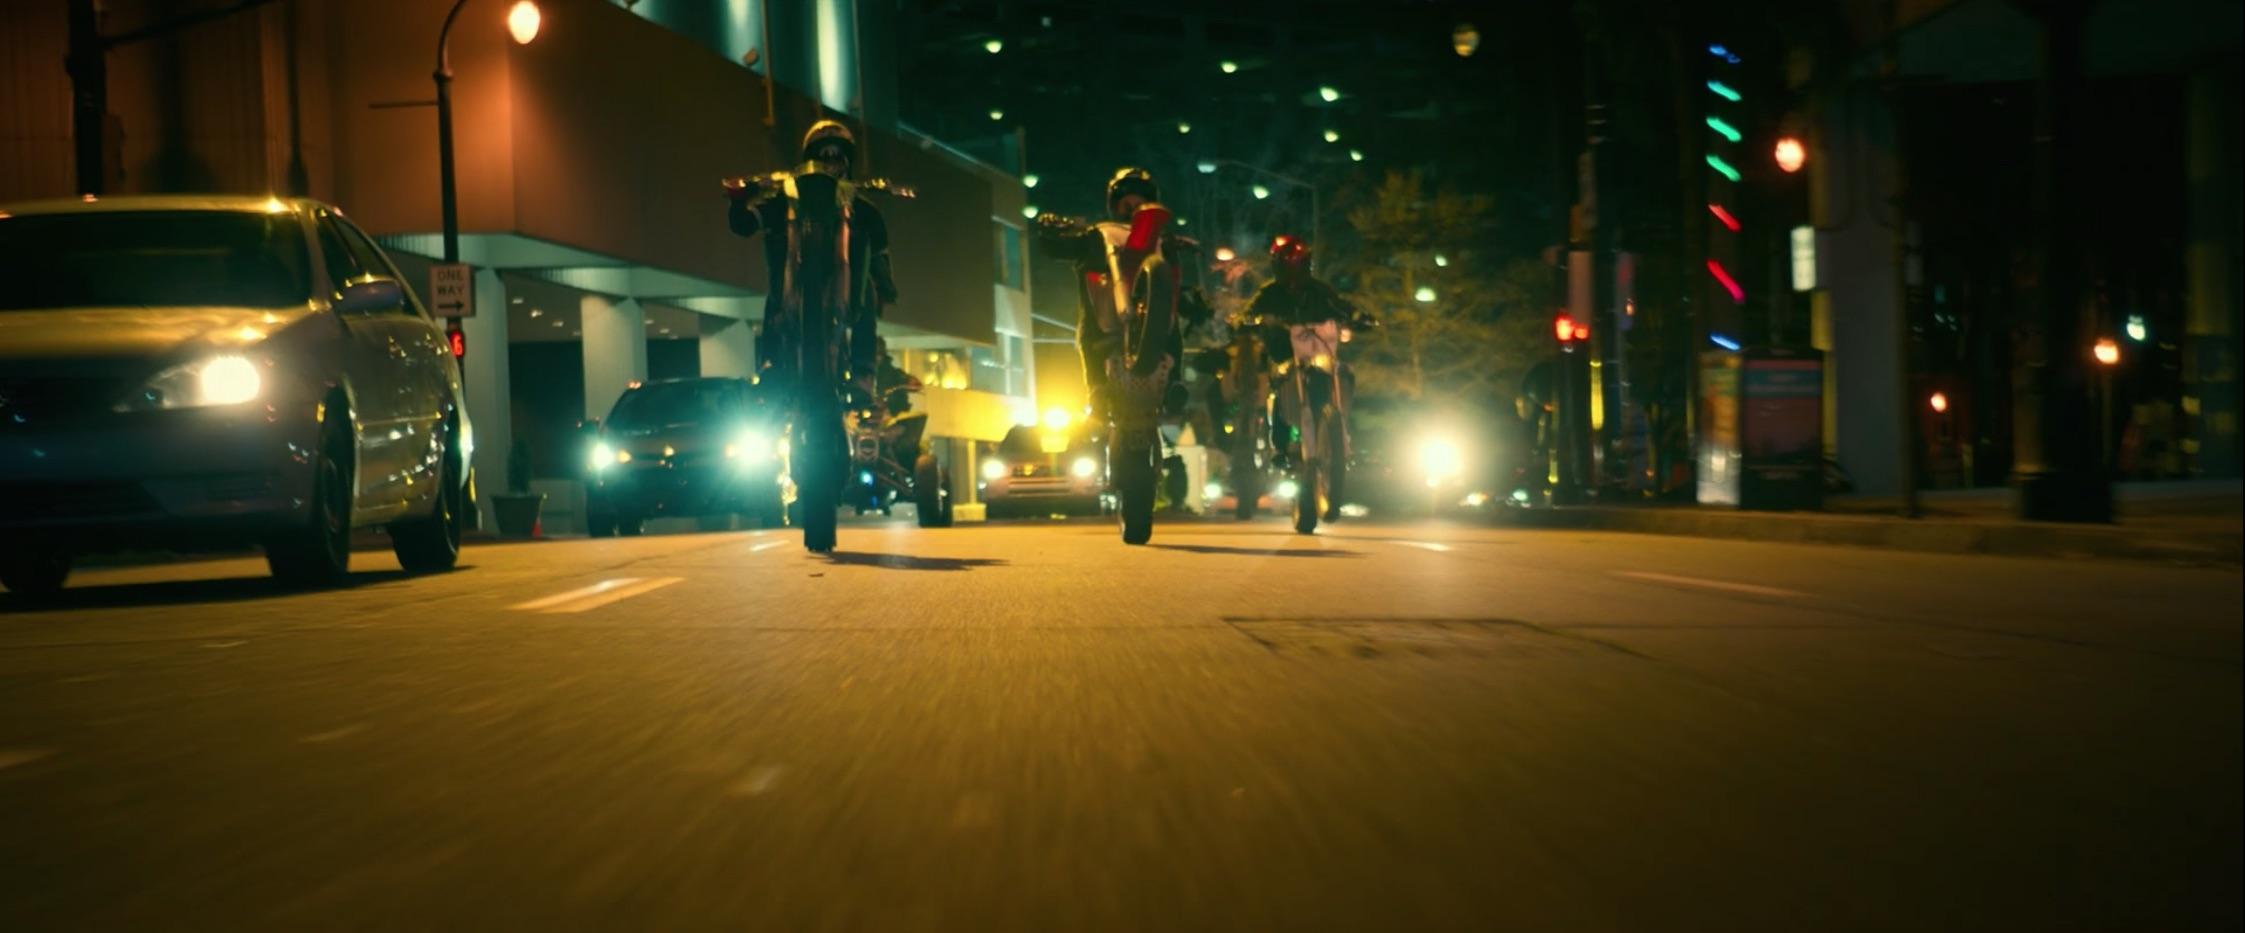 Bad Boys For Life motocross riders on street popping one wheel